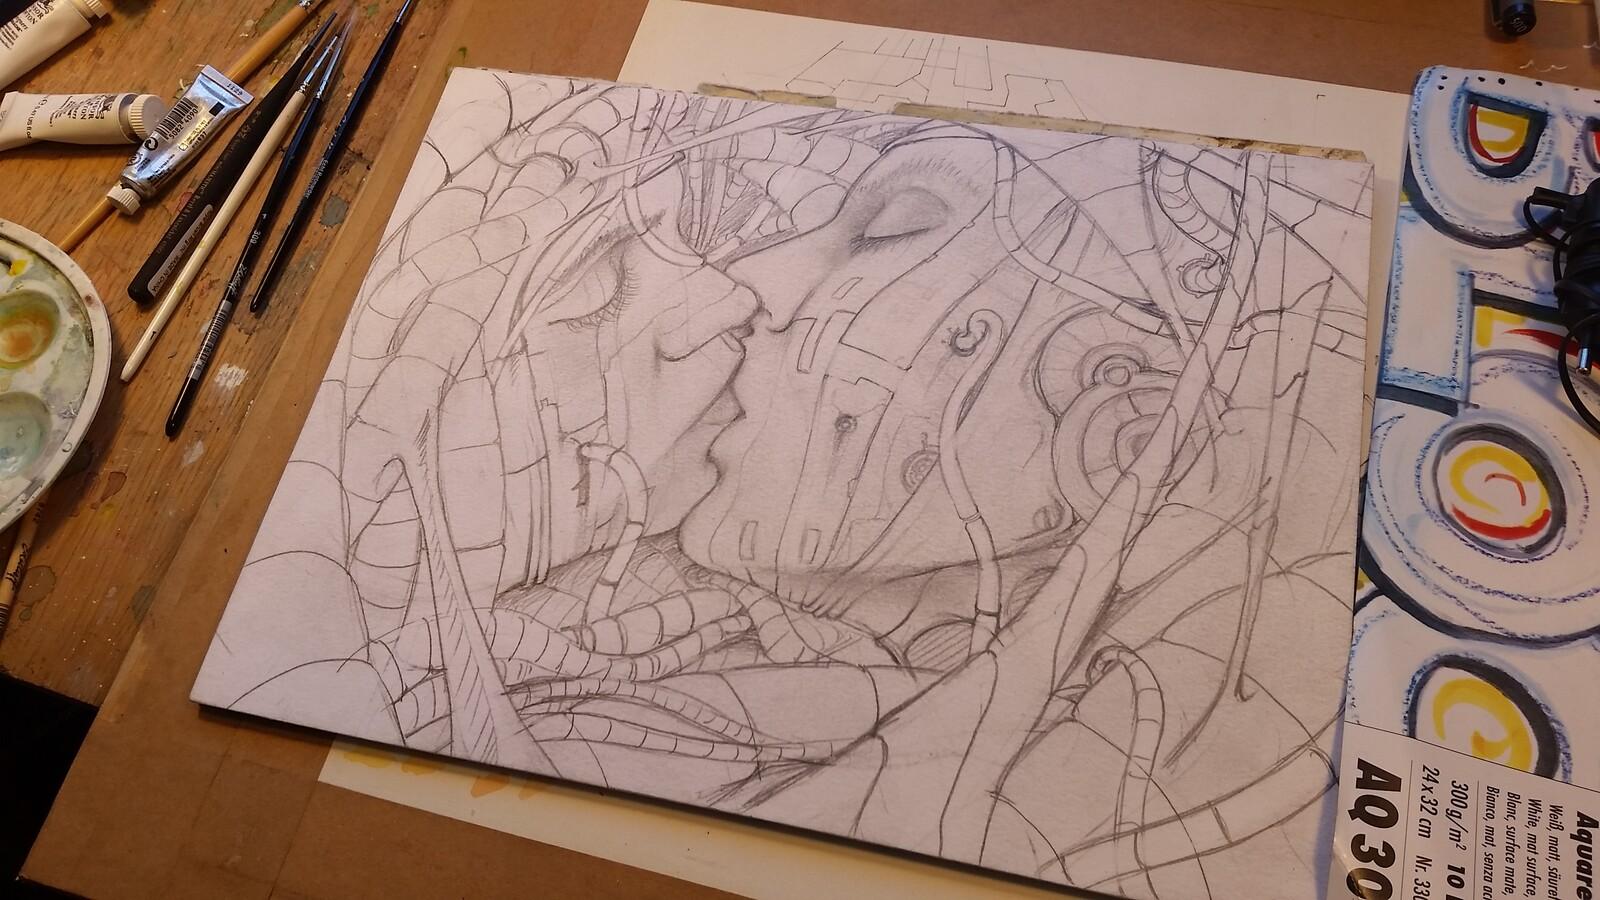 Work in progress: Pencil.